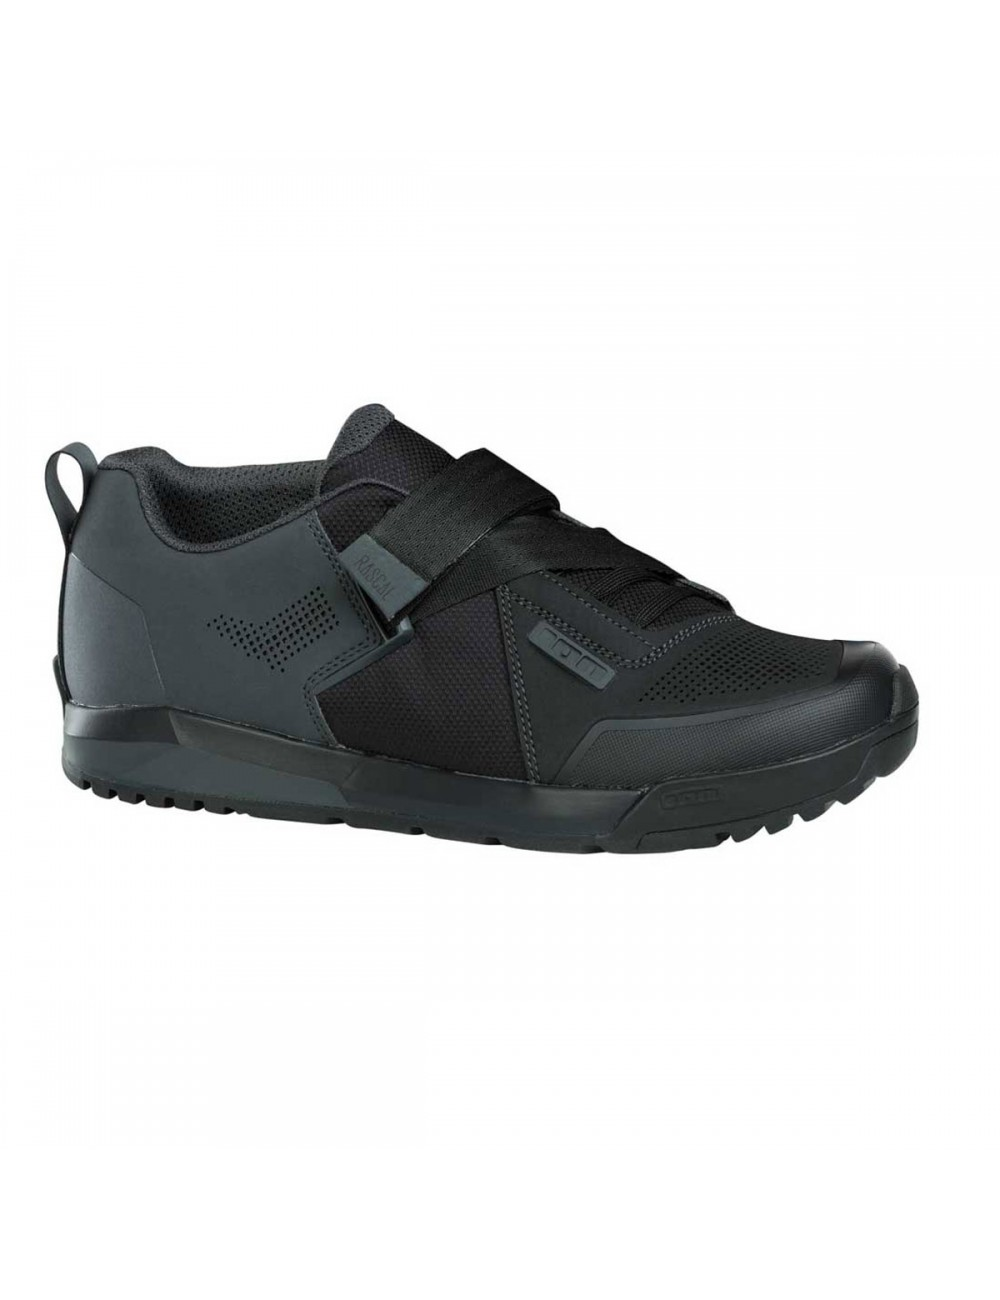 ION Rascal Shoe - Black_11973